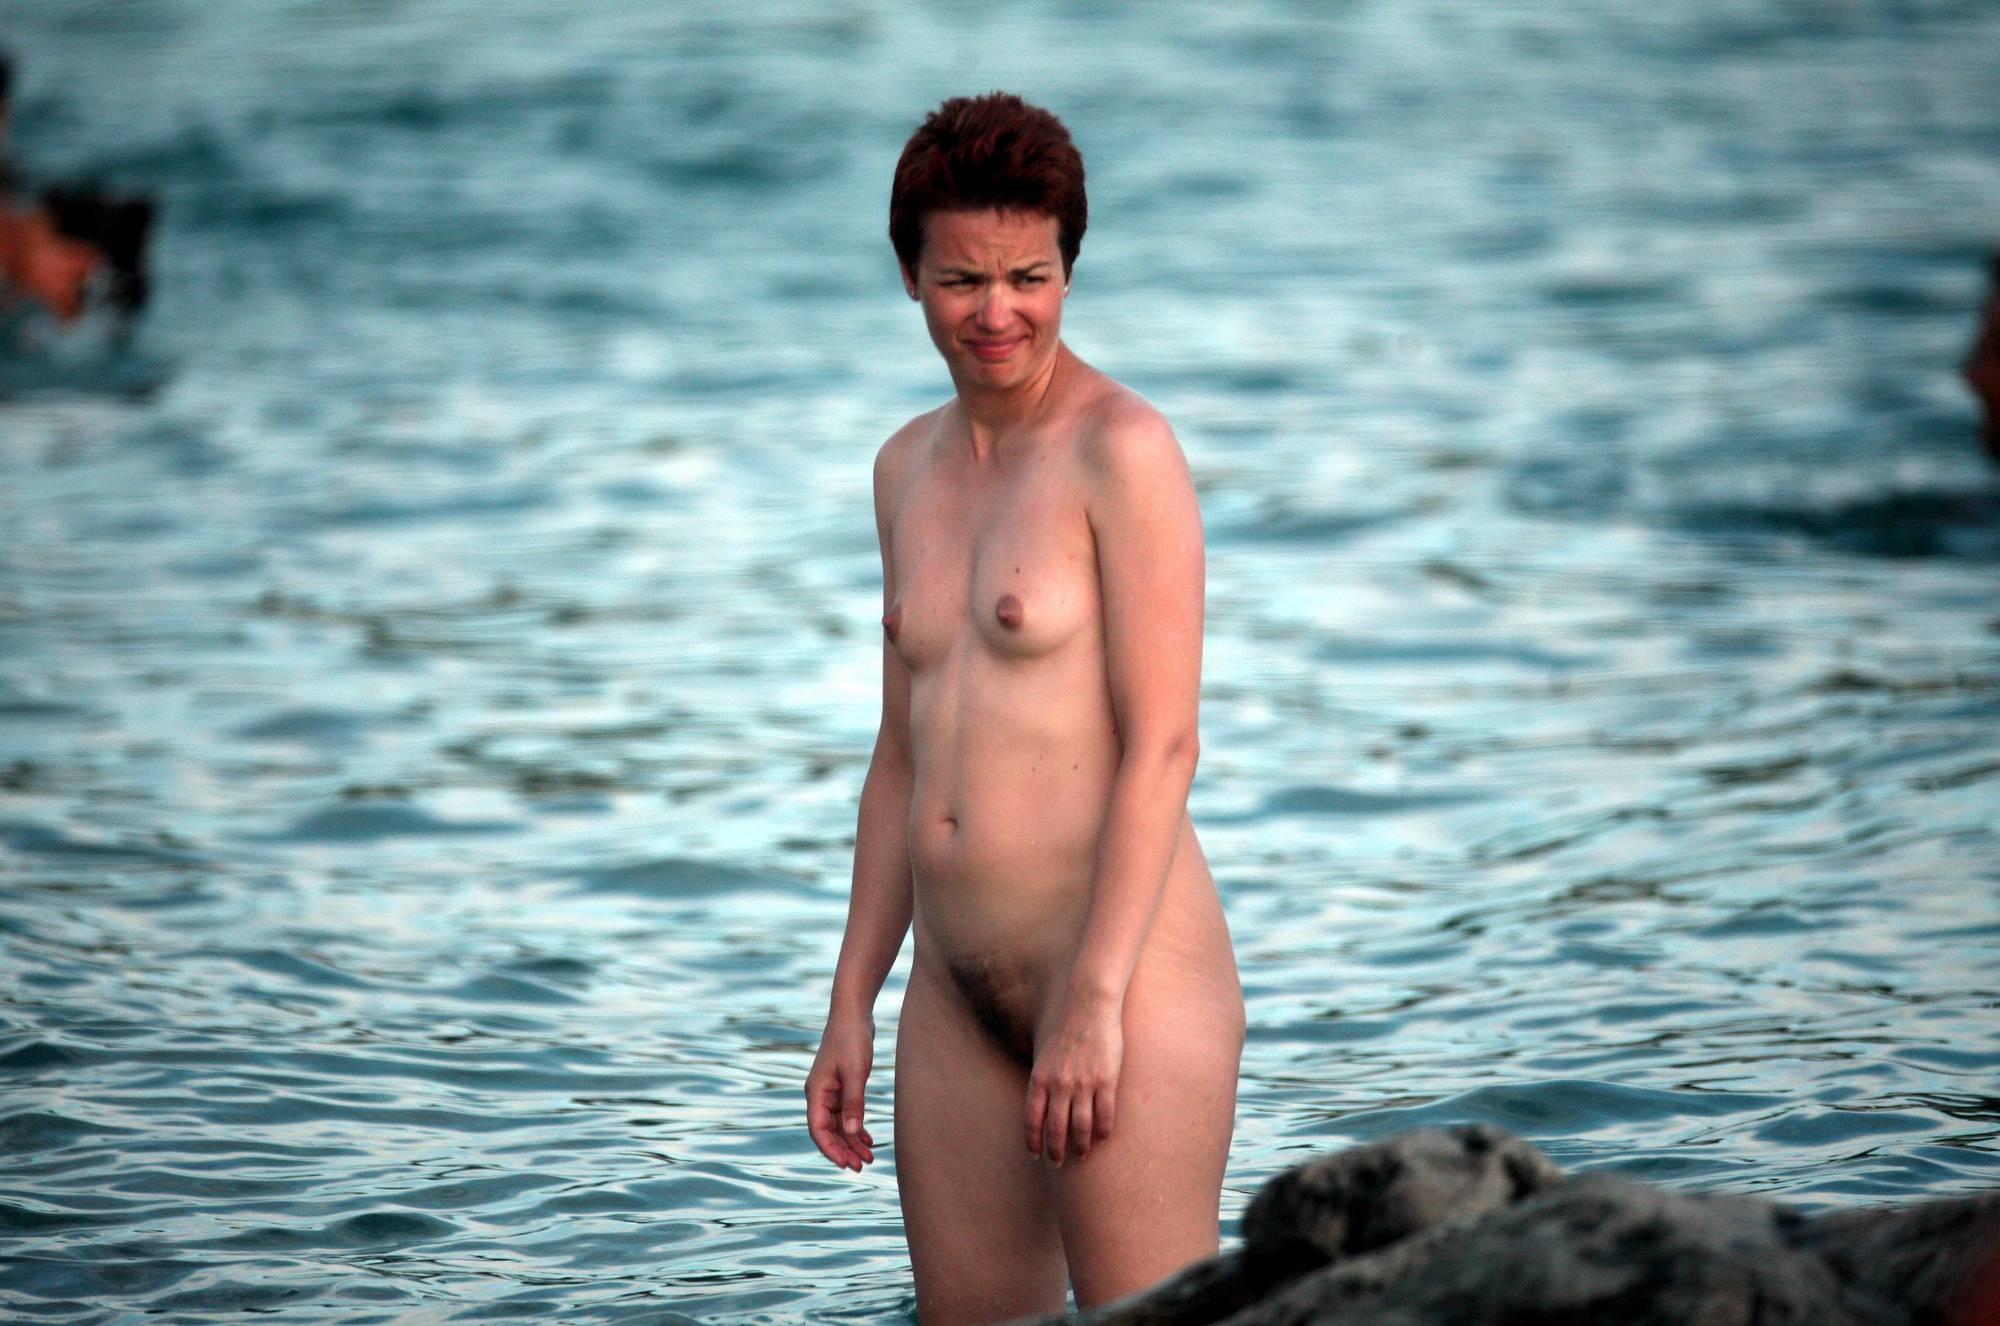 Nudist Pics Granny With Her Grandson - 2